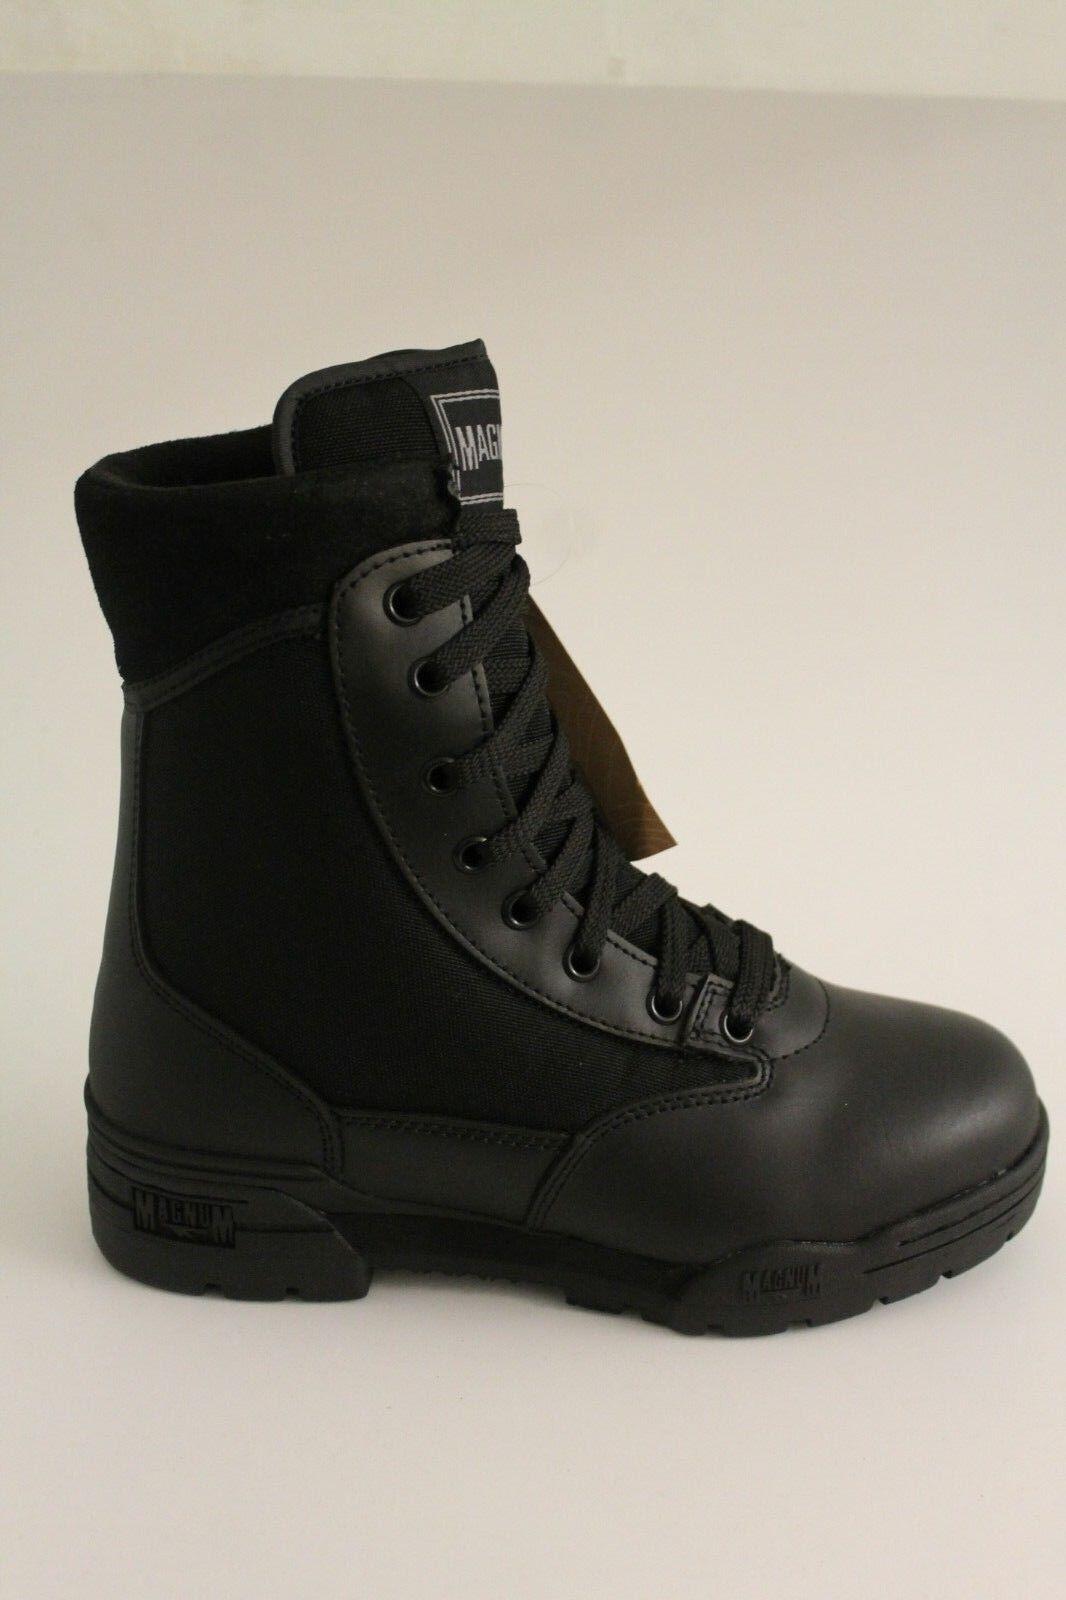 Hi-Tec Magnum Classic Stiefel Leather Nylon Slip Resistant NON SAFETY